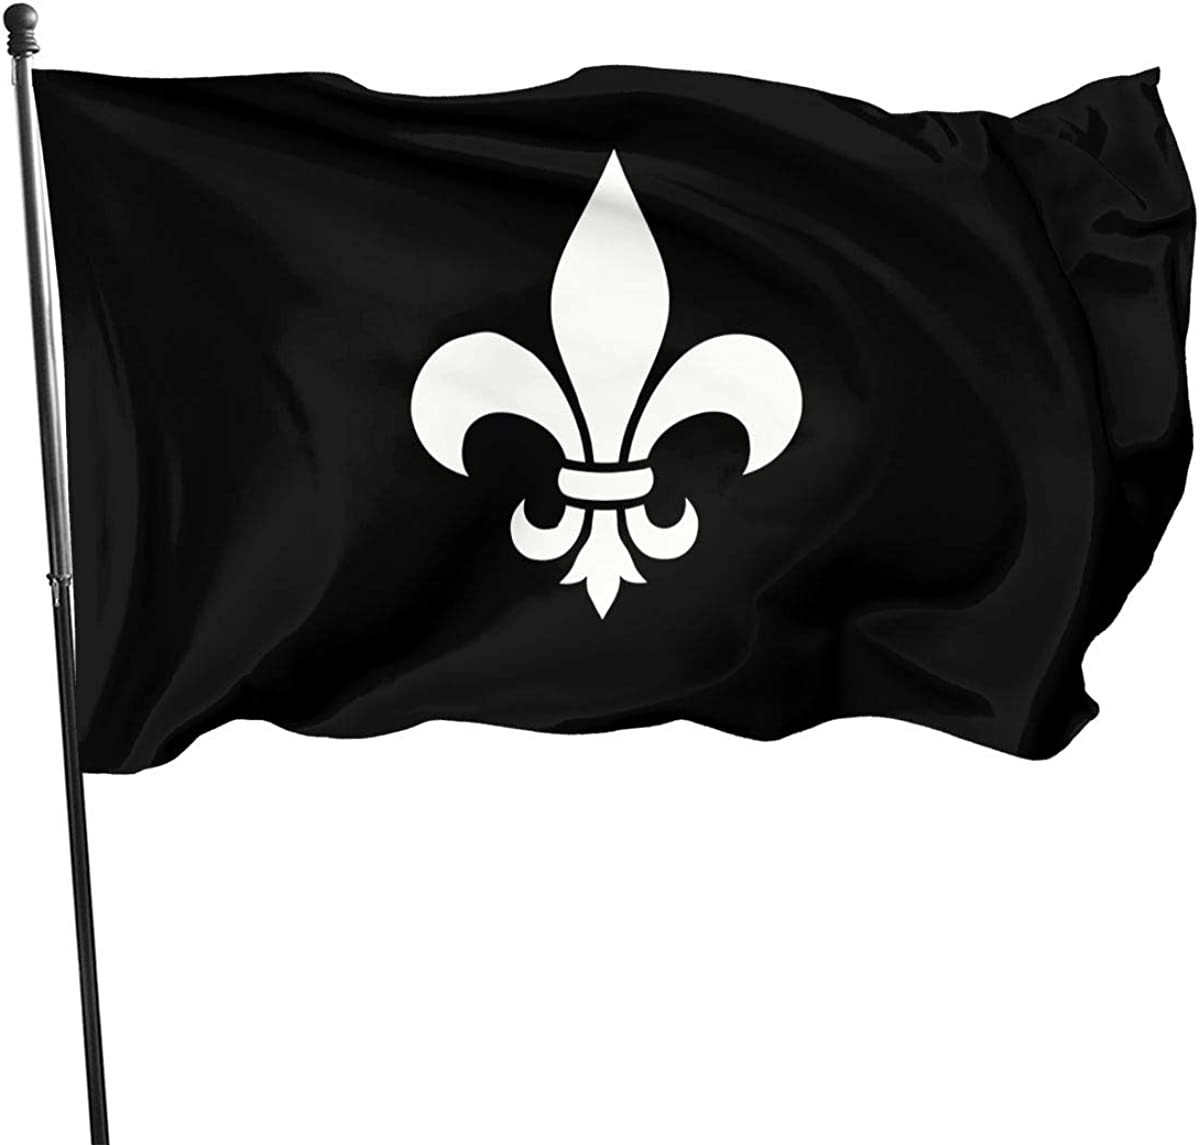 Fleur De Lis 3x5 FT American Flag, Outdoor Banner, Family Banner, Garden Banner Black